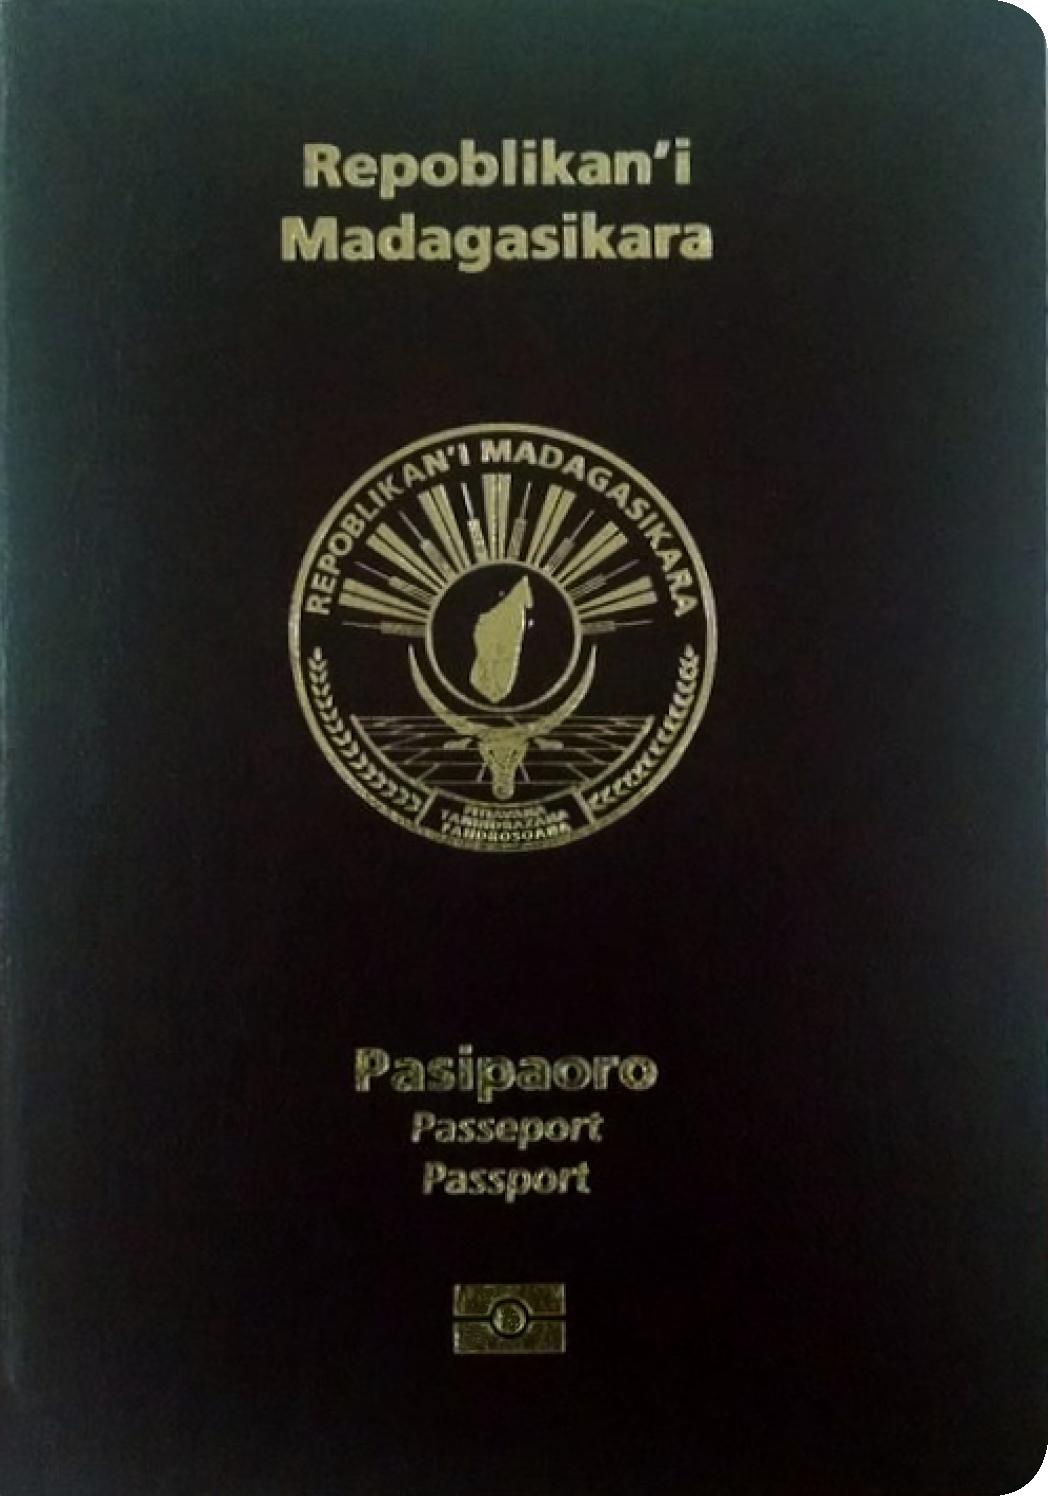 A regular or ordinary Madagascar passport - Front side